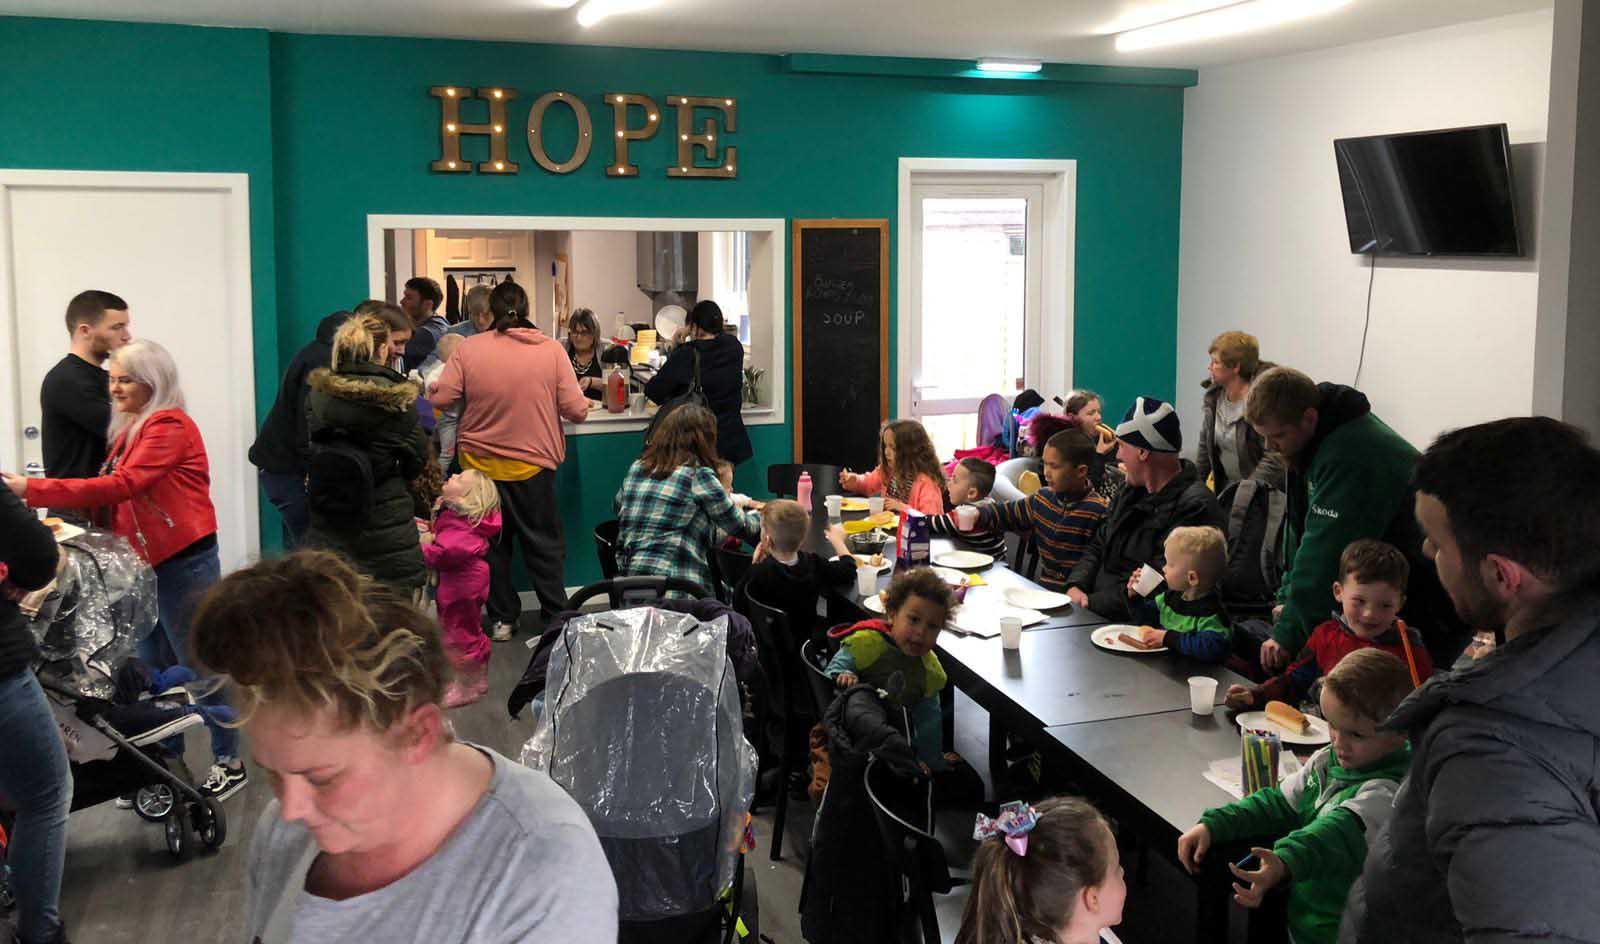 Community Cafe in Bingham - Hope Church